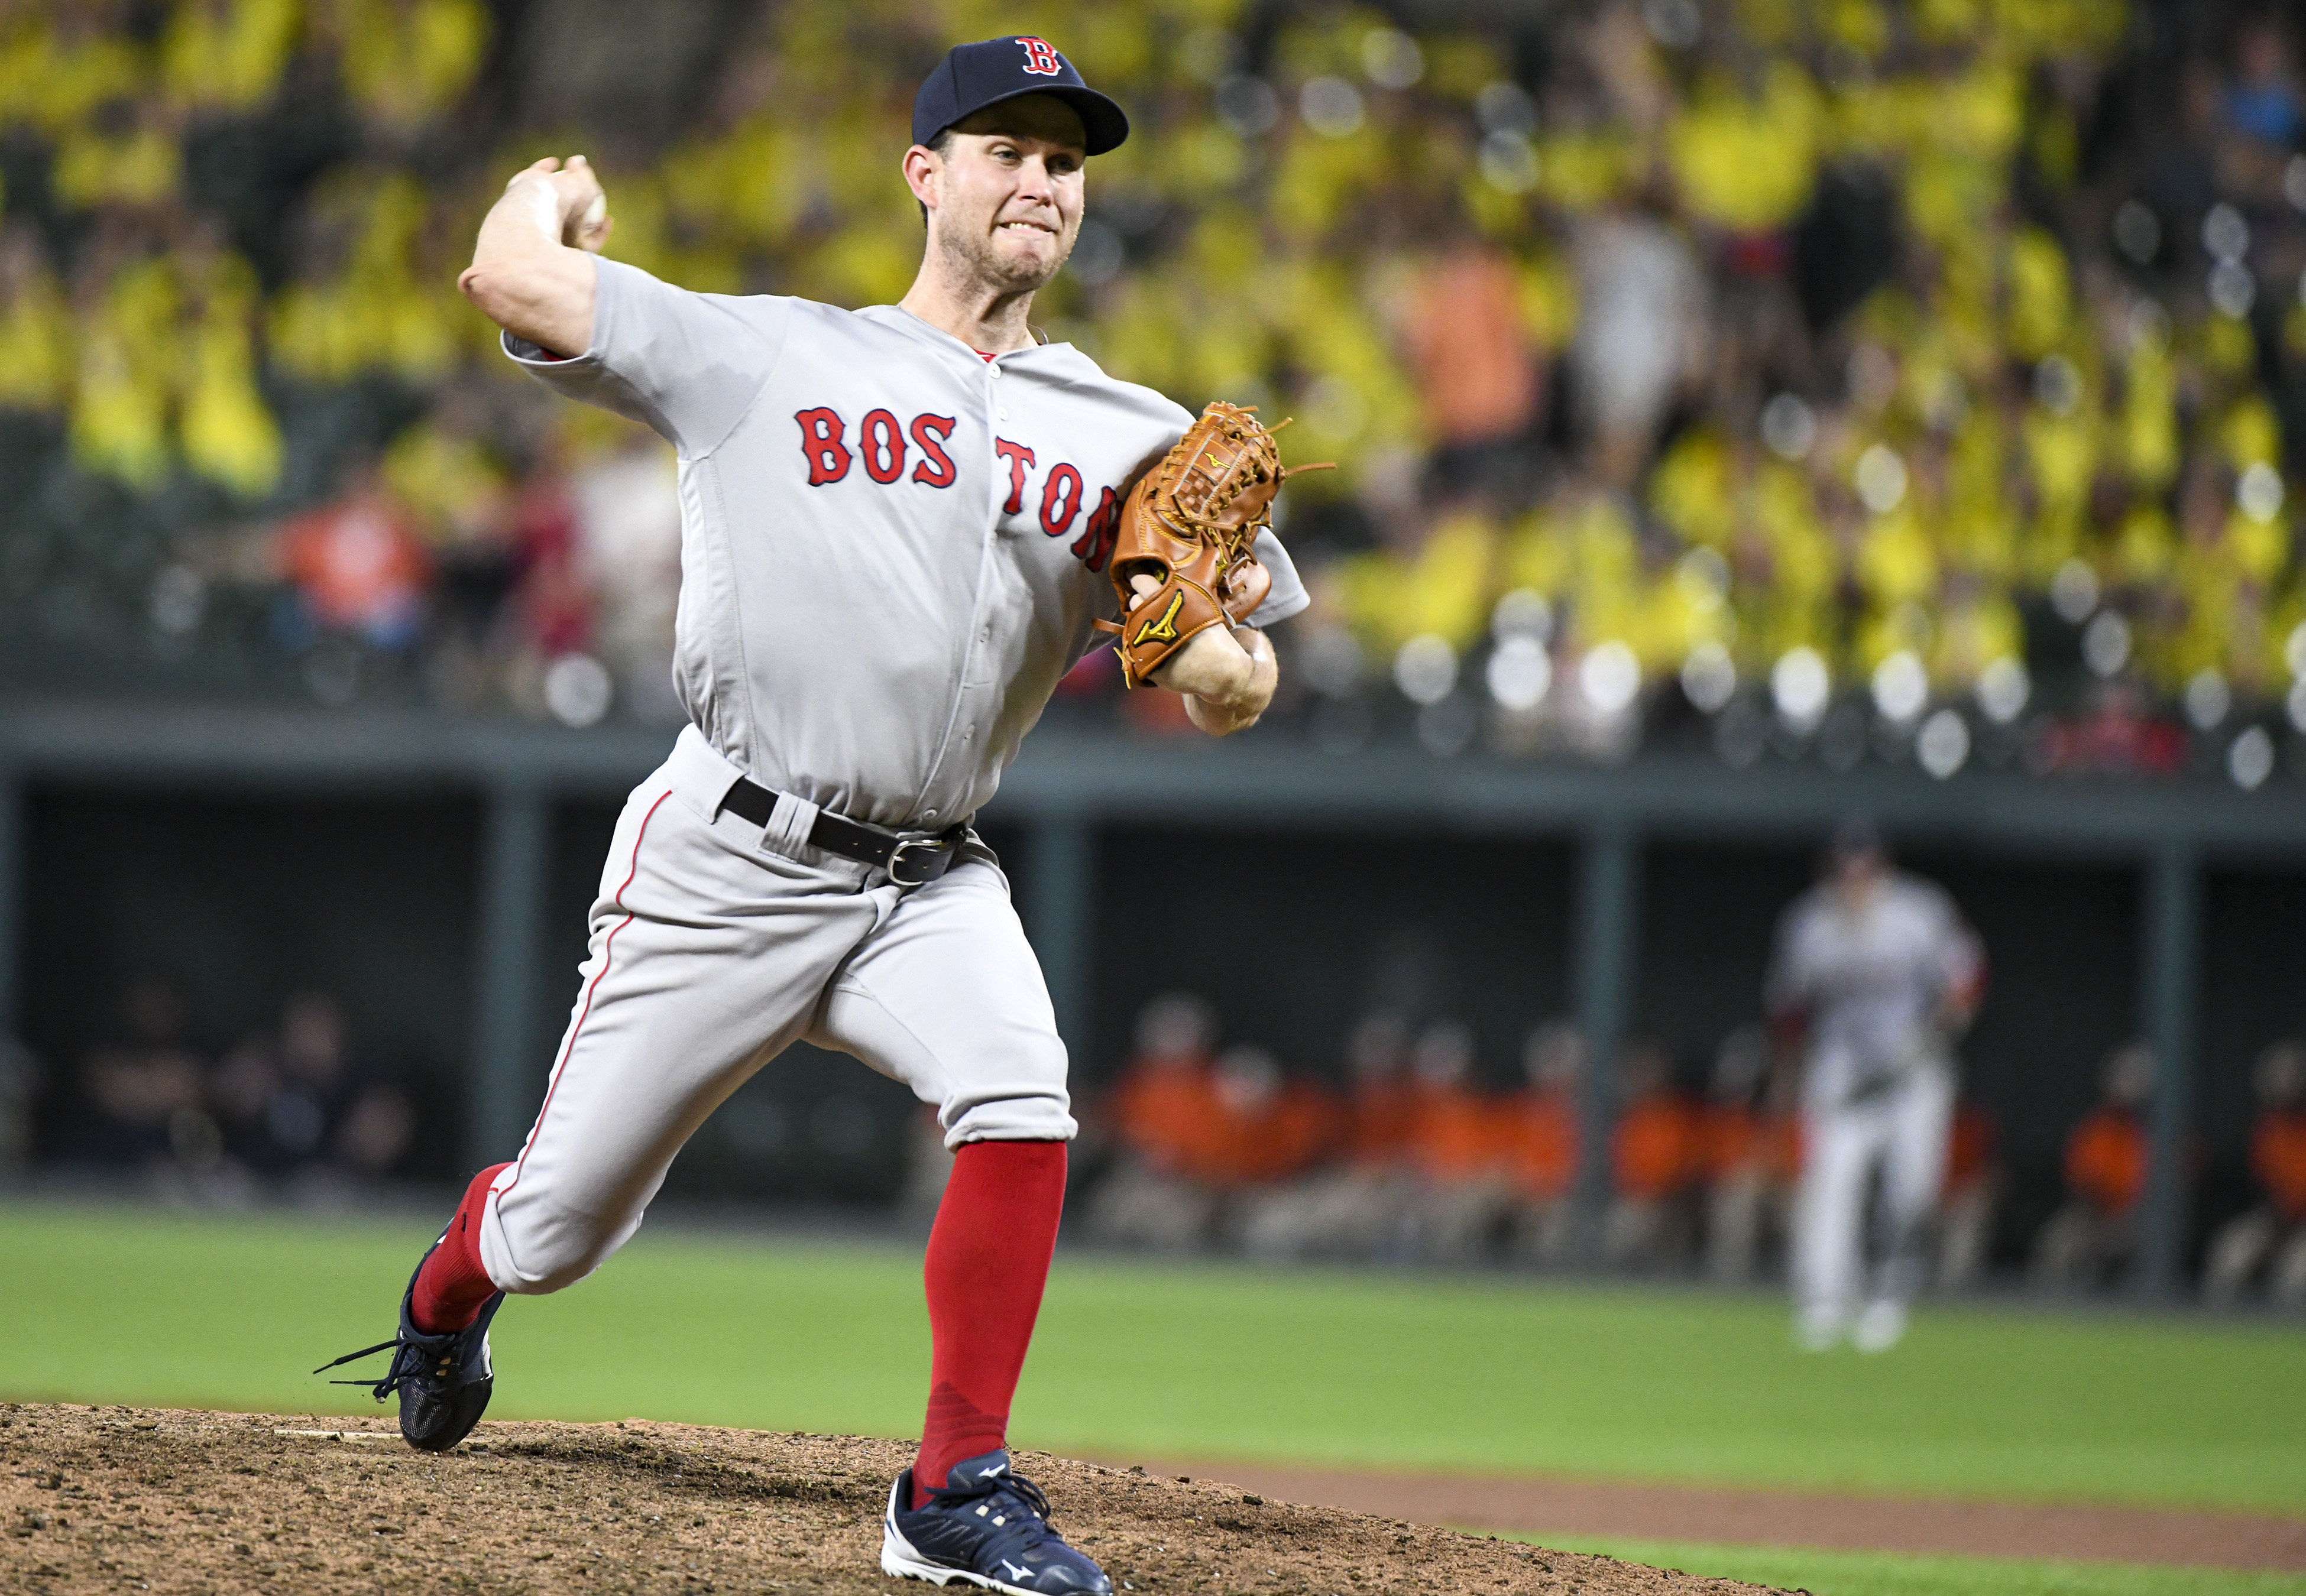 MLB: JUL 19 Red Sox at Orioles